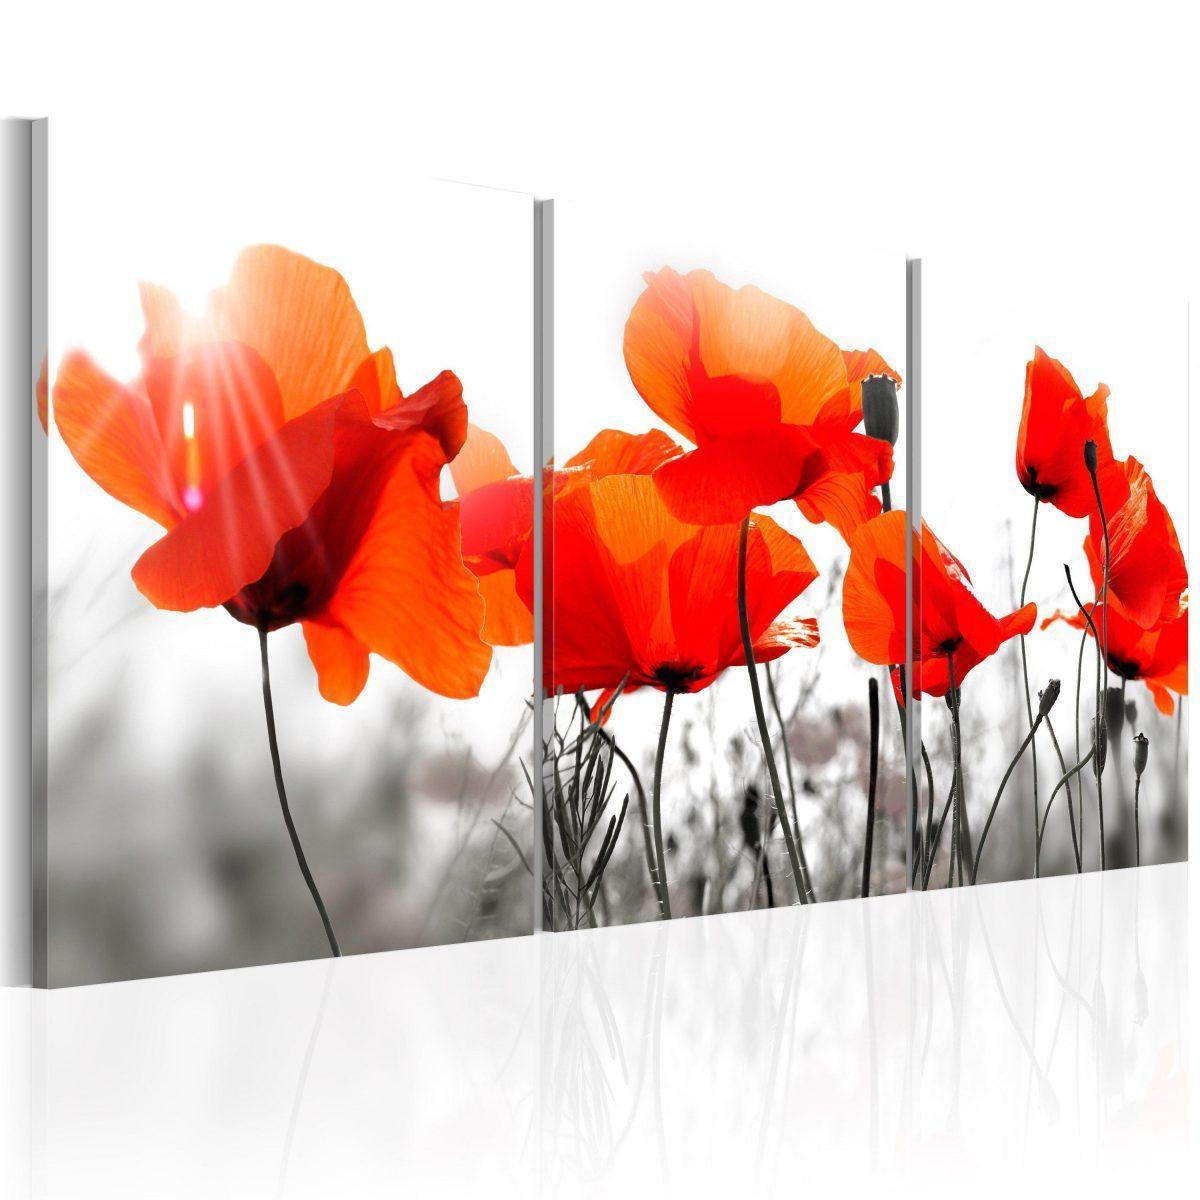 Canvas Tavla - Charming Poppies - 60x30